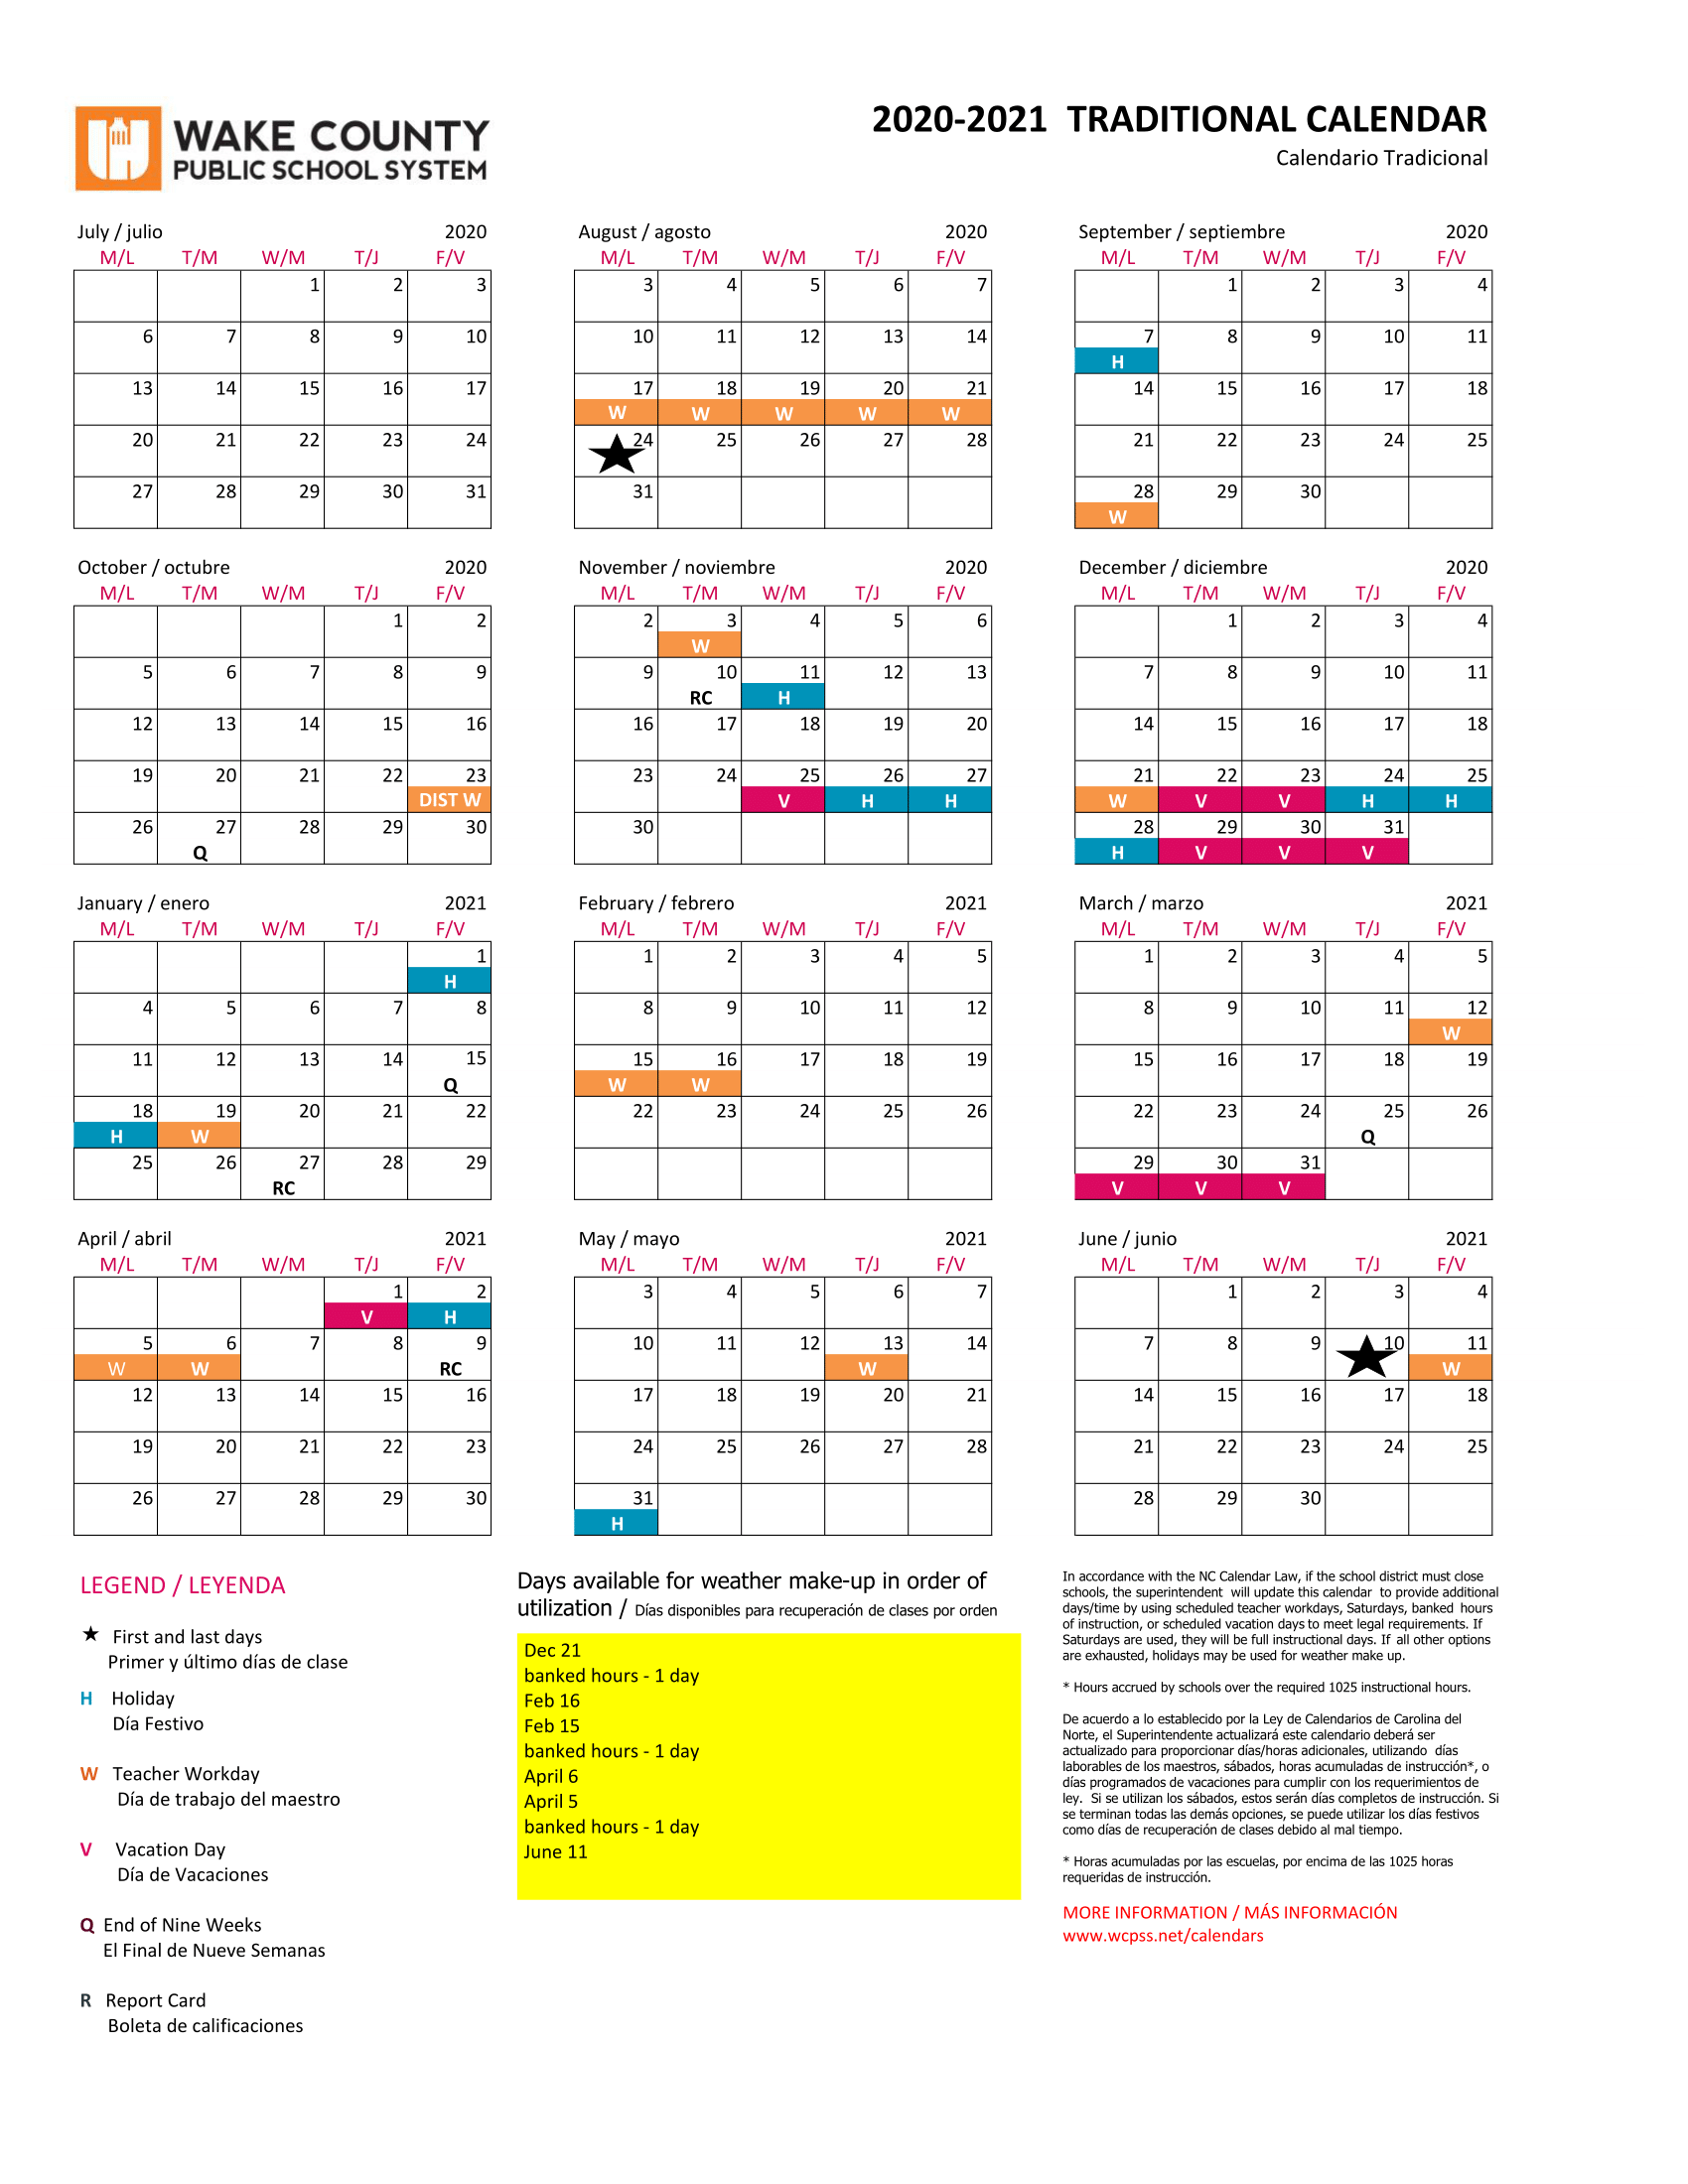 Wcpss Calendar 2022 23.Wake County School Calendar 2021 2022 Important Update County School Calendar